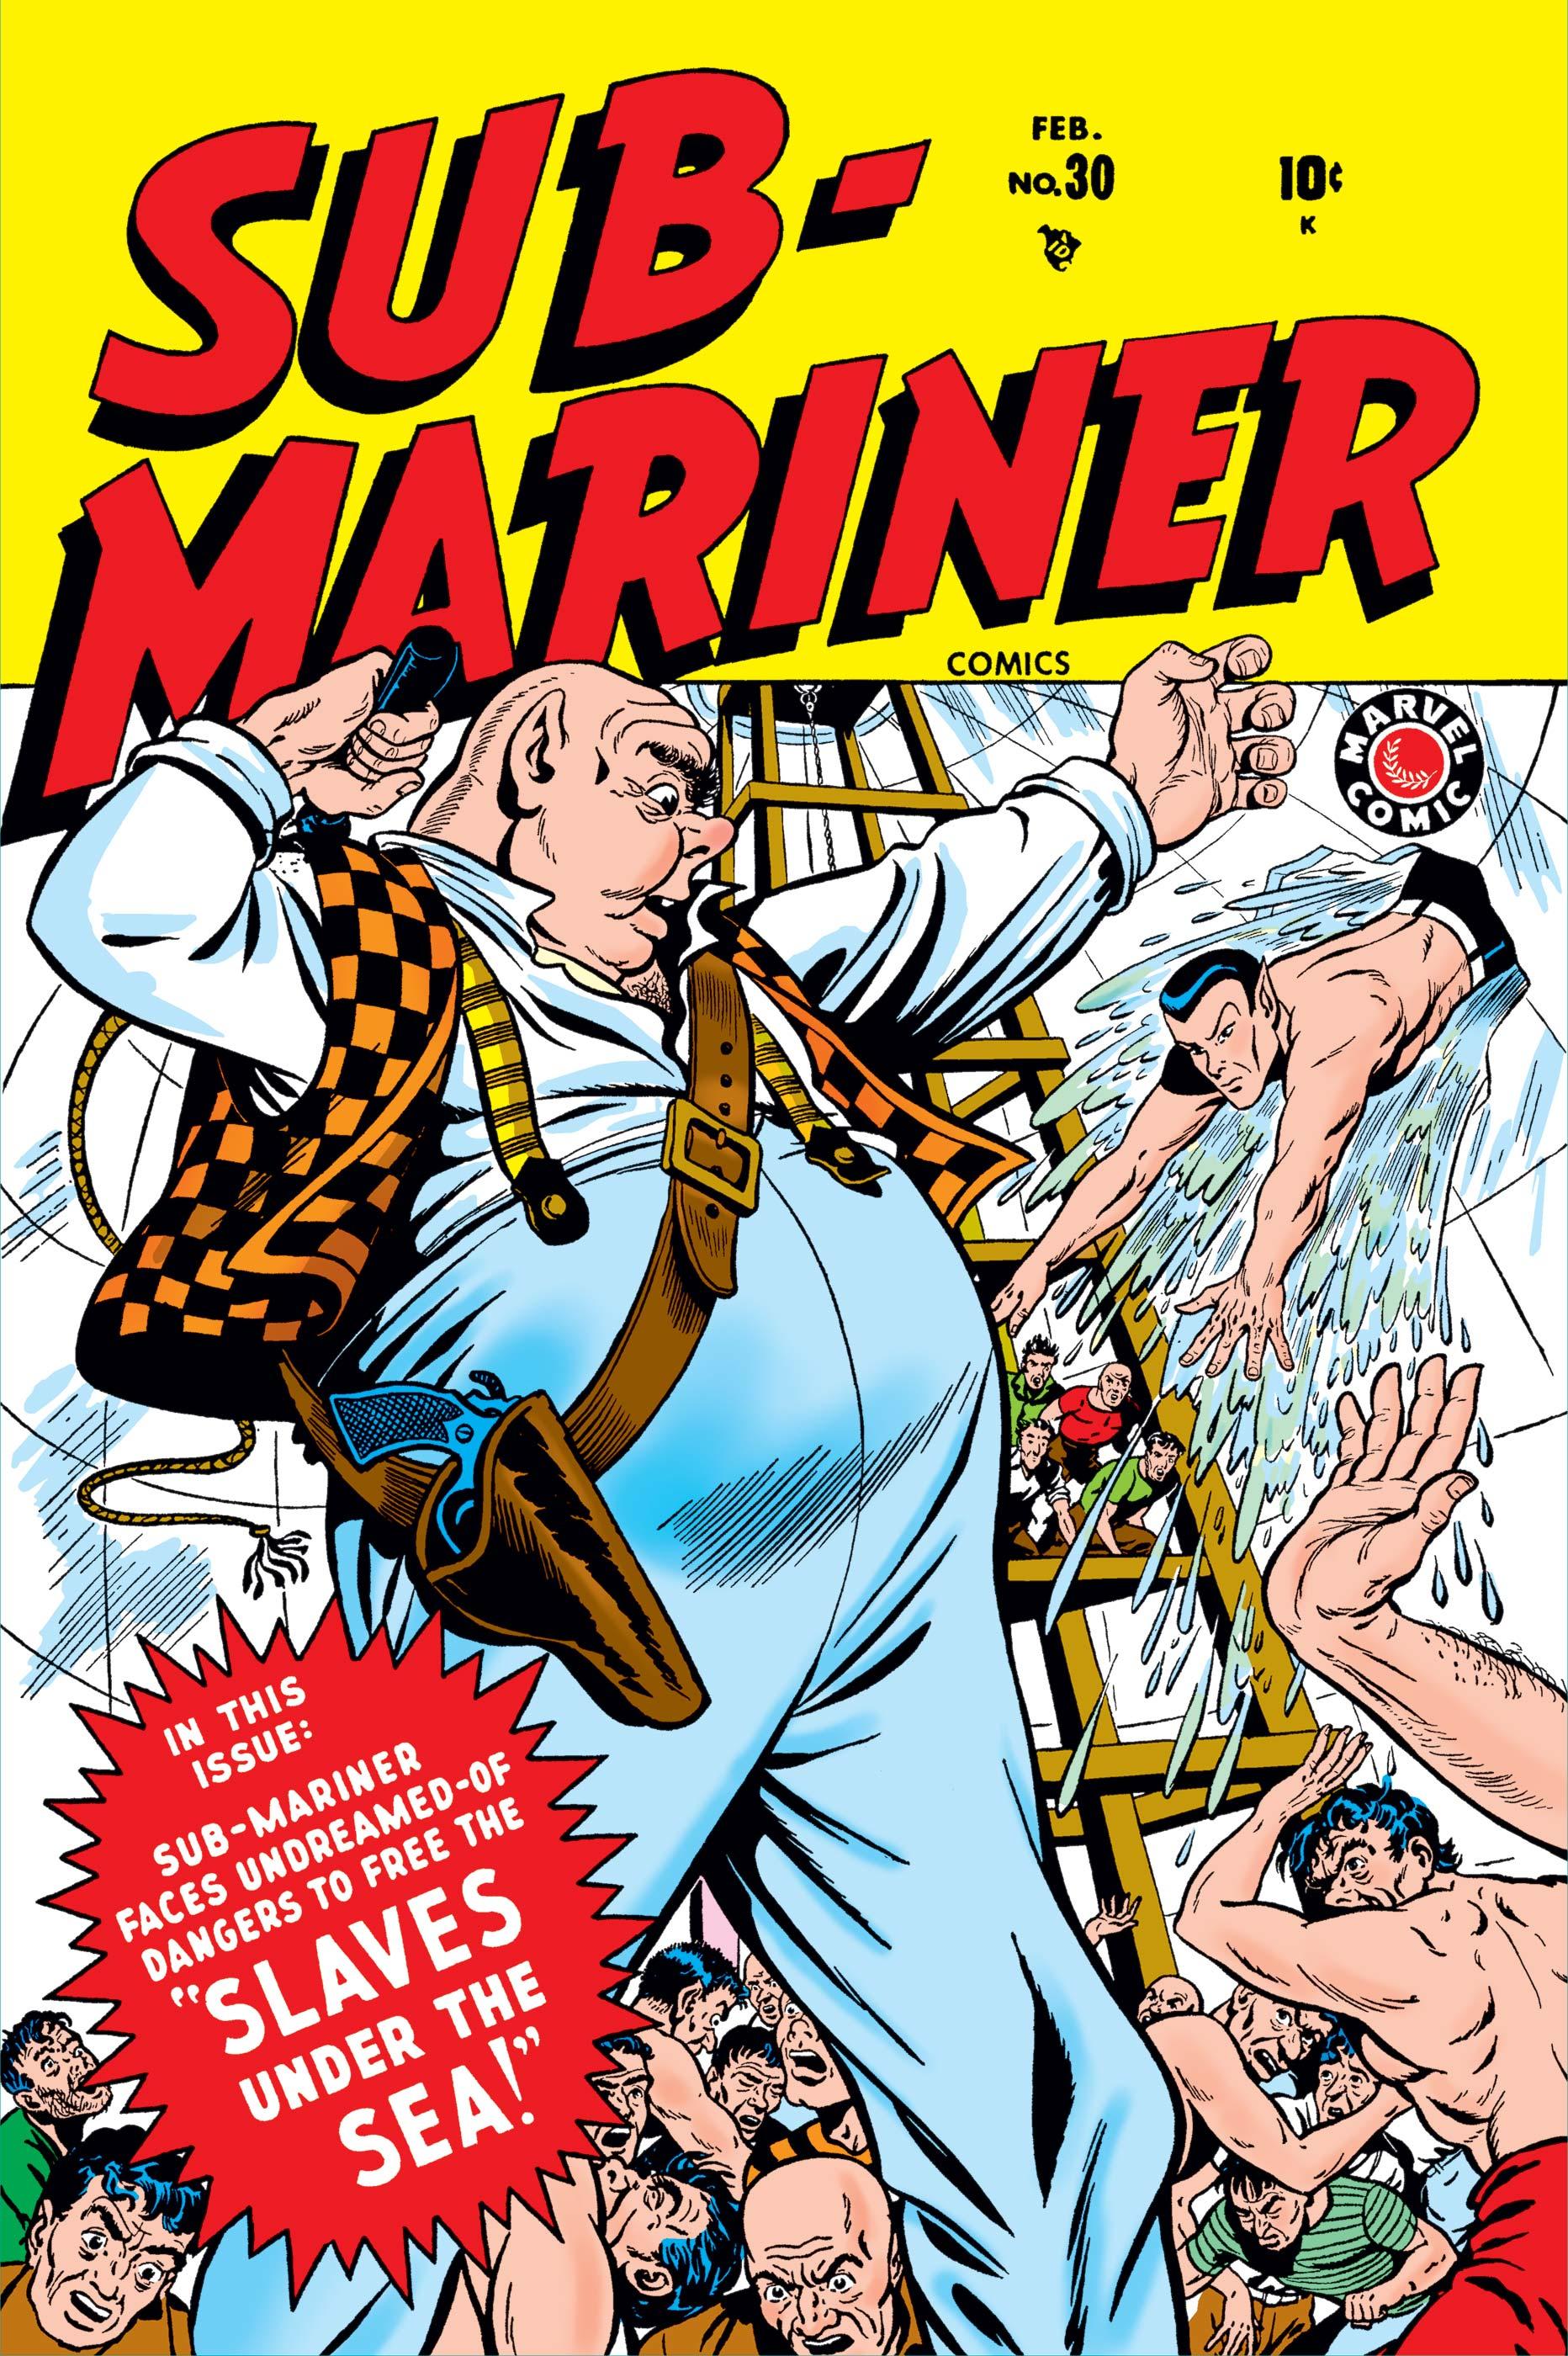 Sub-Mariner Comics (1941) #30